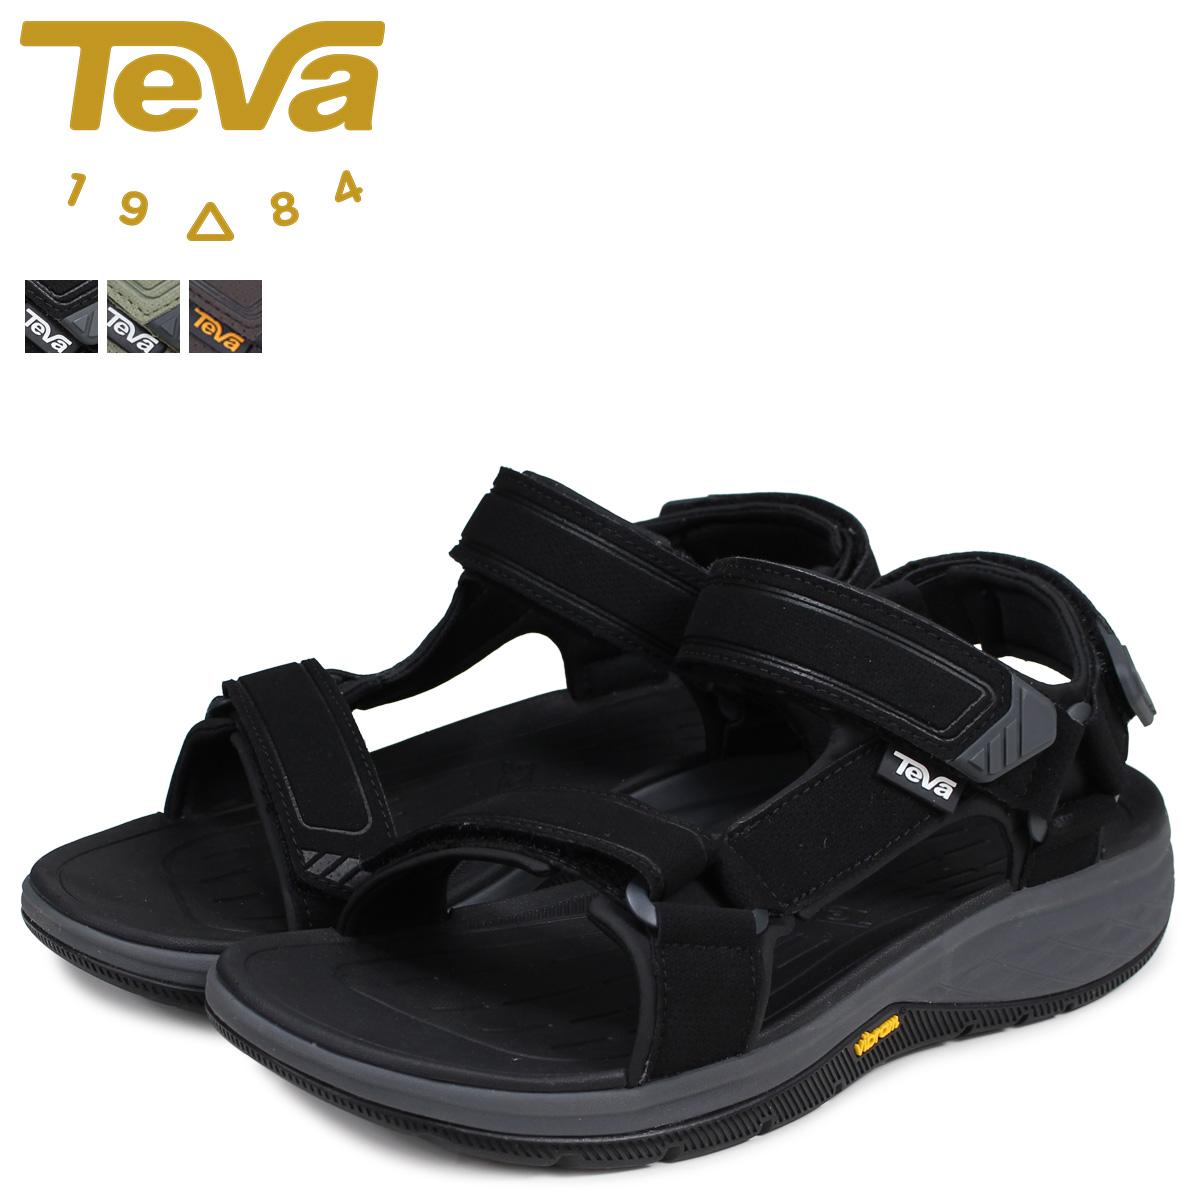 Teva テバ サンダル ストラータ ユニバーサル メンズ STRATA UNIVERSAL ブラック オリーブ 黒 1099445 [3/10 追加入荷]